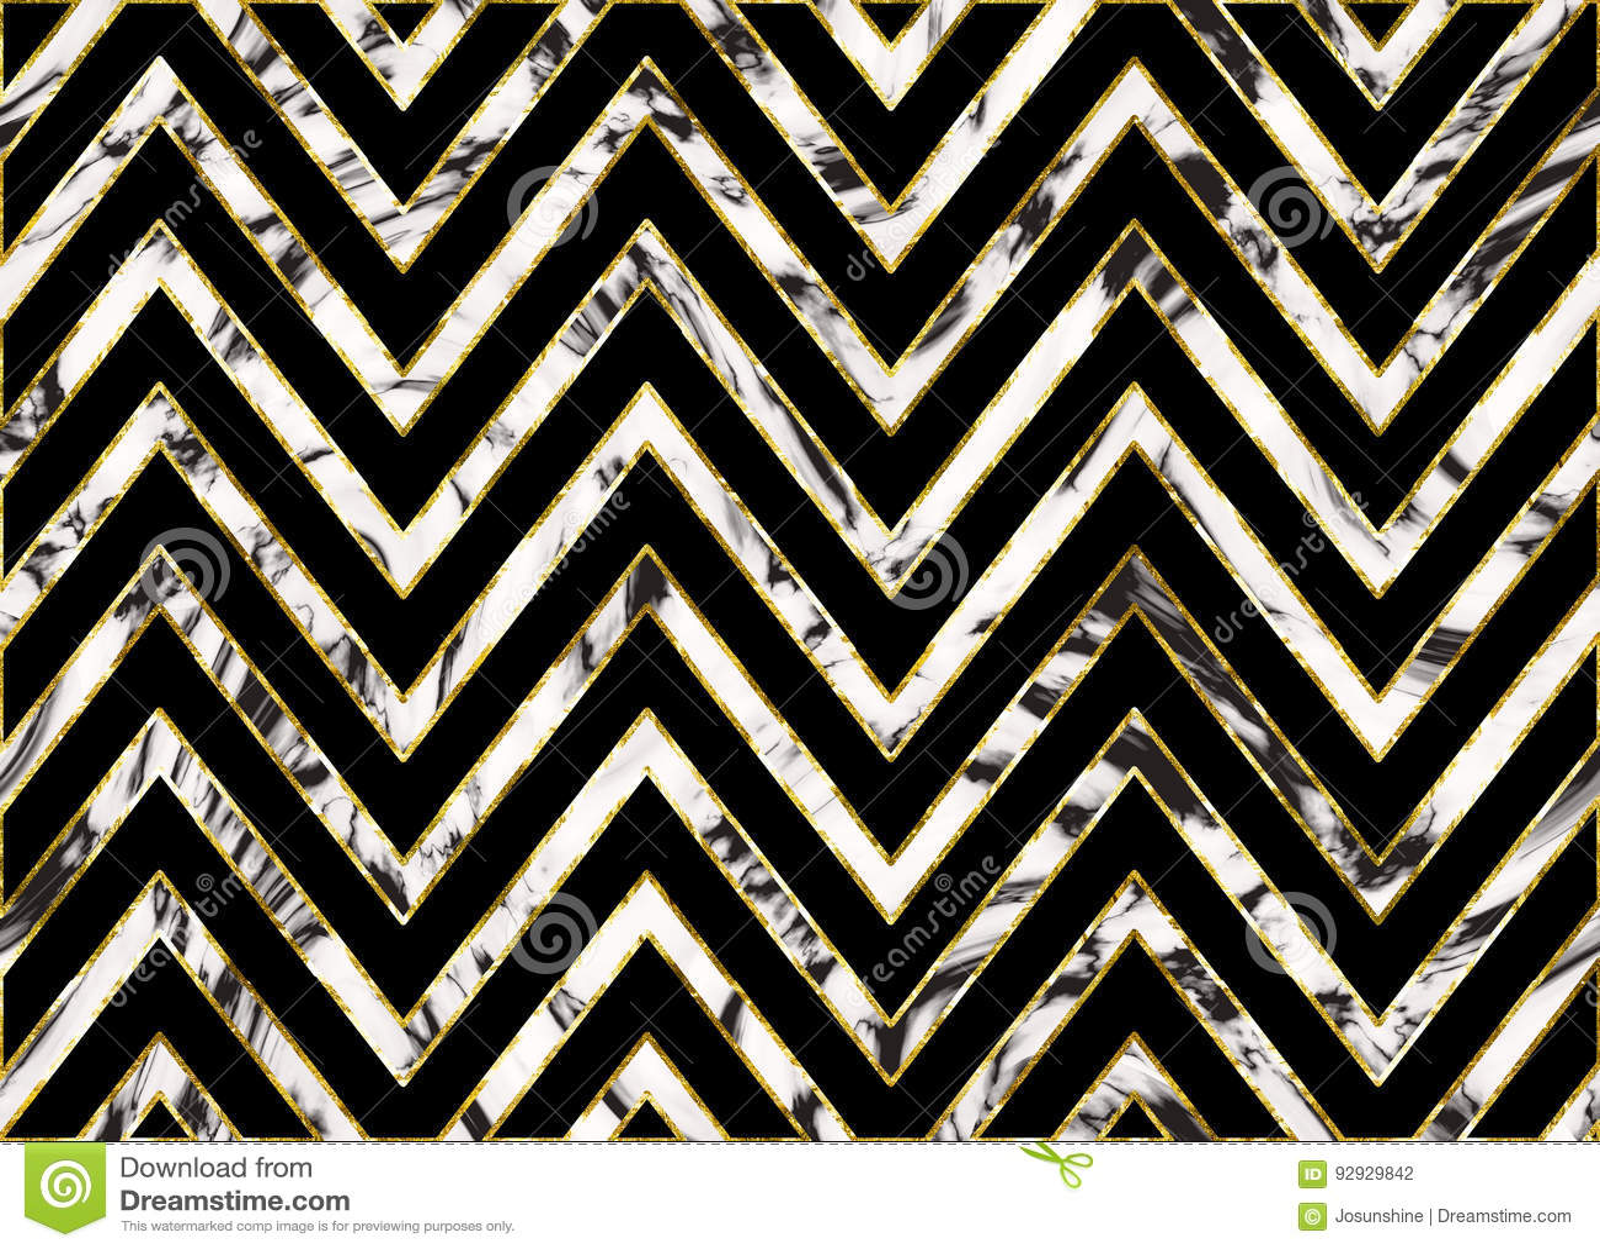 marble chevron stripes background pattern stock illustration